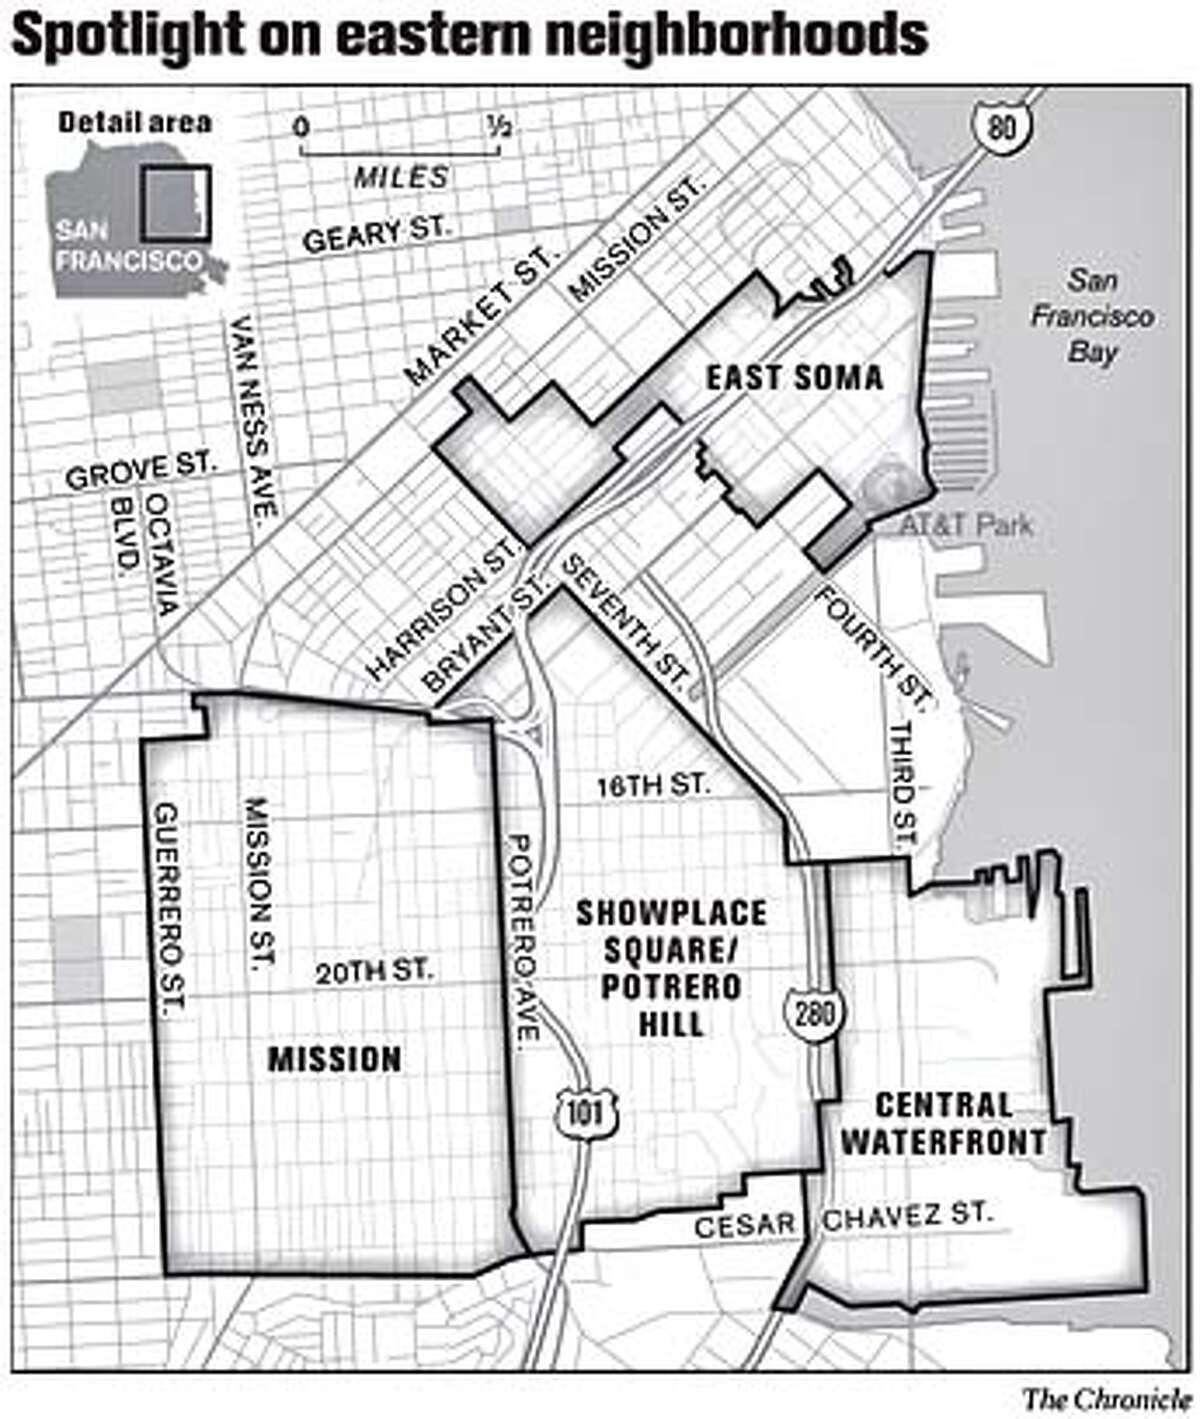 Spotlight on Eastern Neighborhoods. Chronicle Graphic